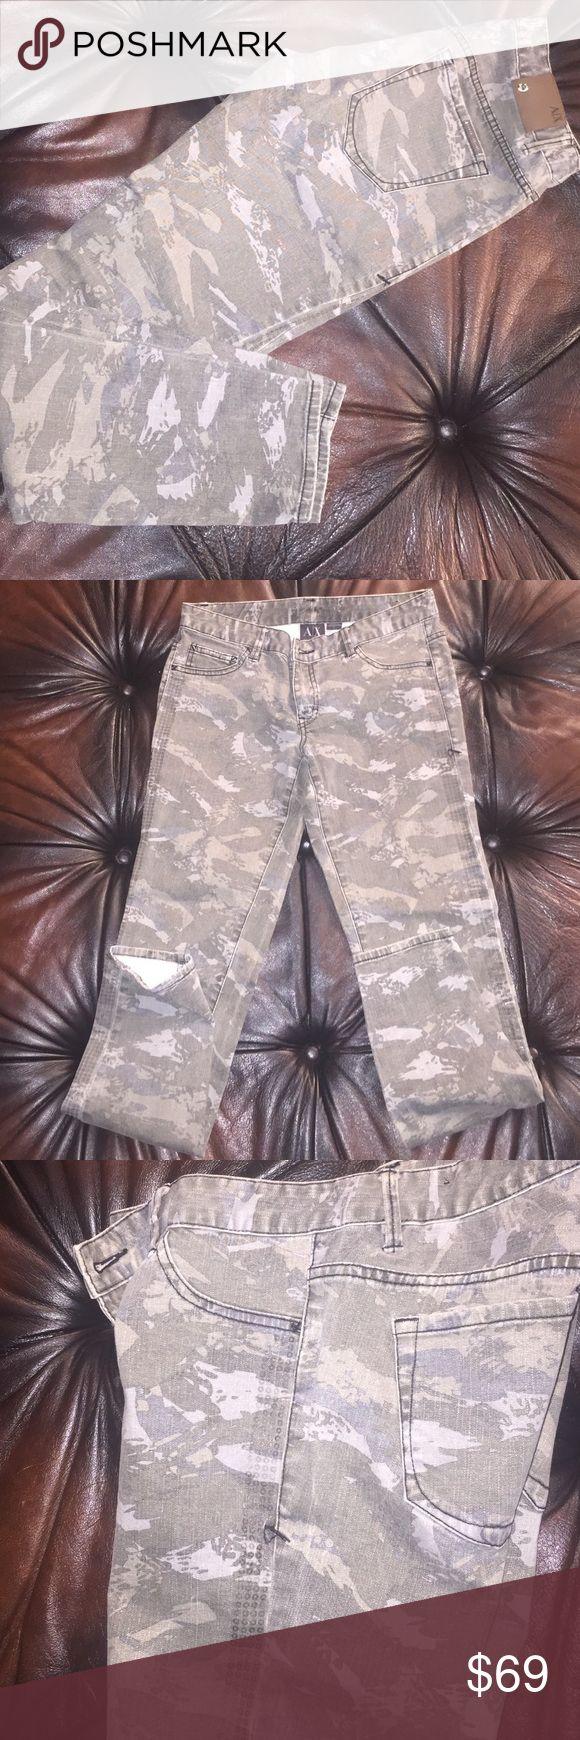 Selling this A/X side Embellished camouflage print skinny jeans on Poshmark! My username is: rsveta. #shopmycloset #poshmark #fashion #shopping #style #forsale #Armani Exchange #Denim